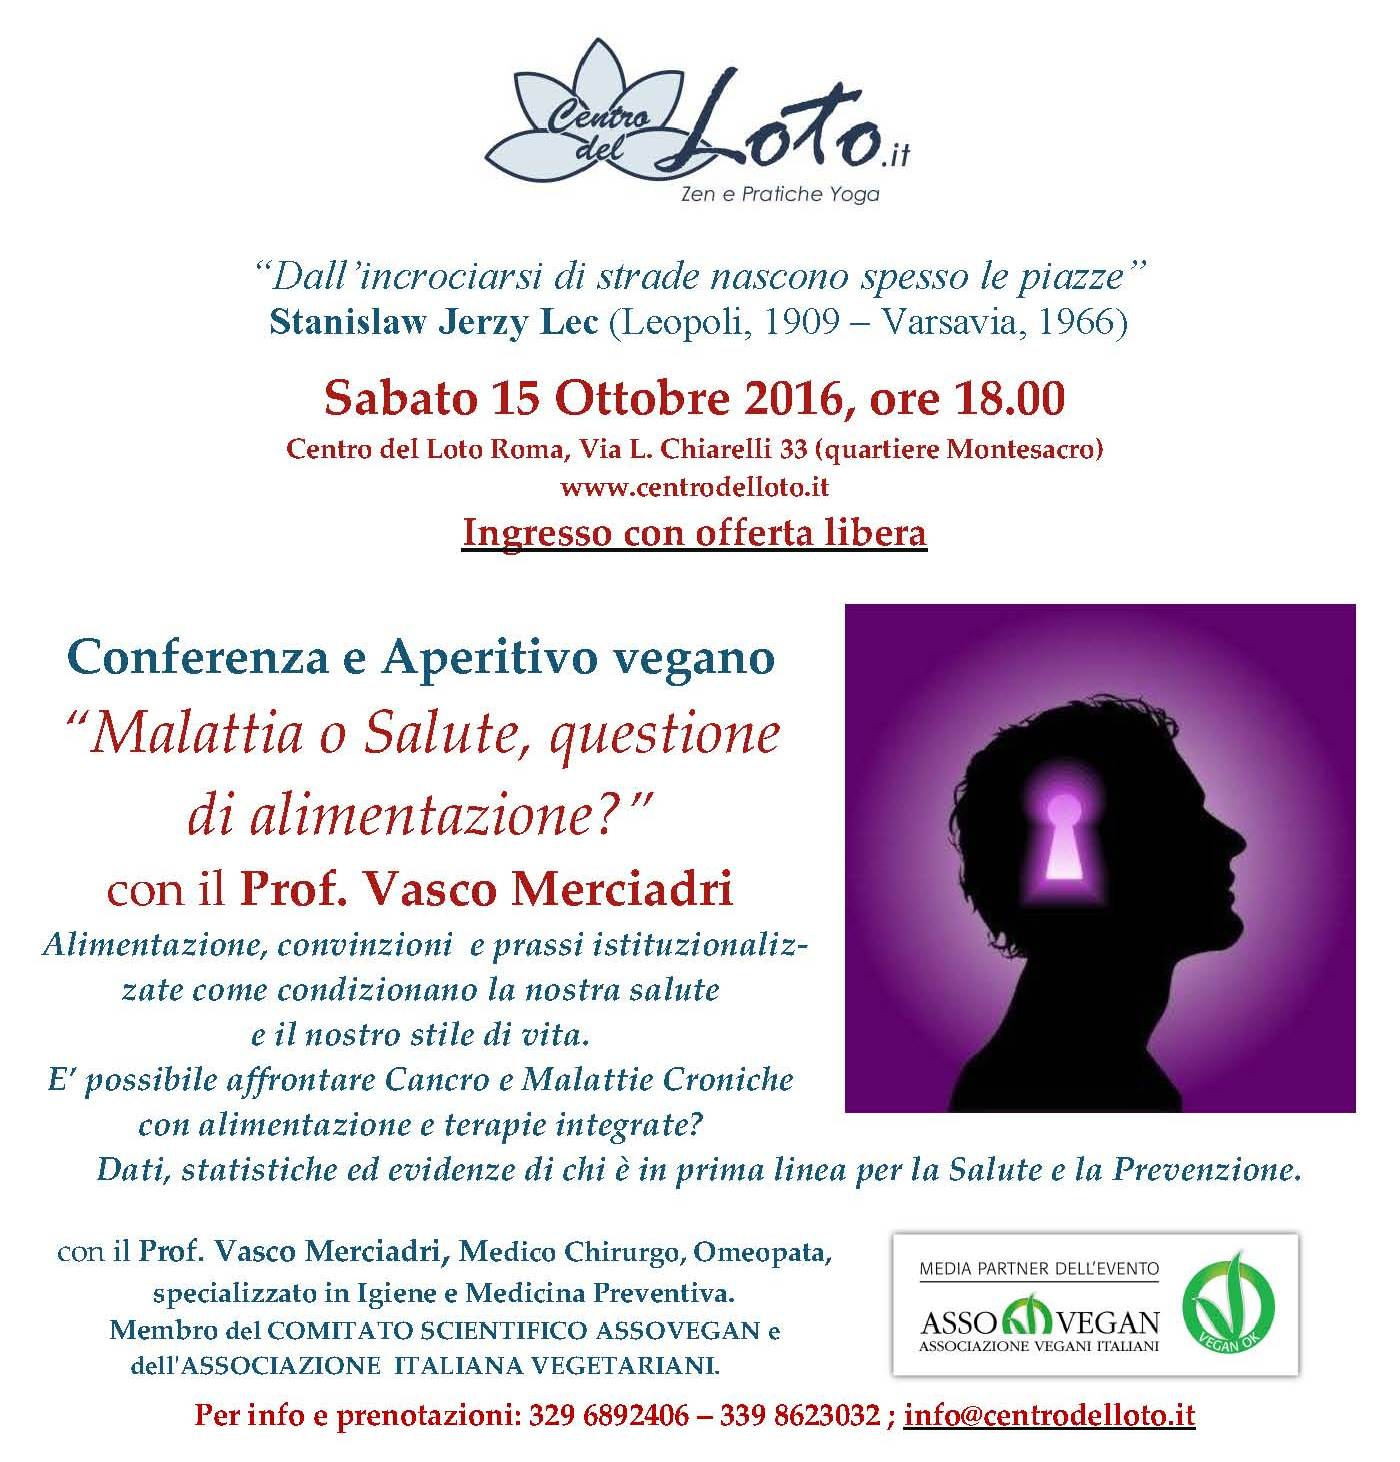 ConferenzaProf.Merciadri10.10.2016